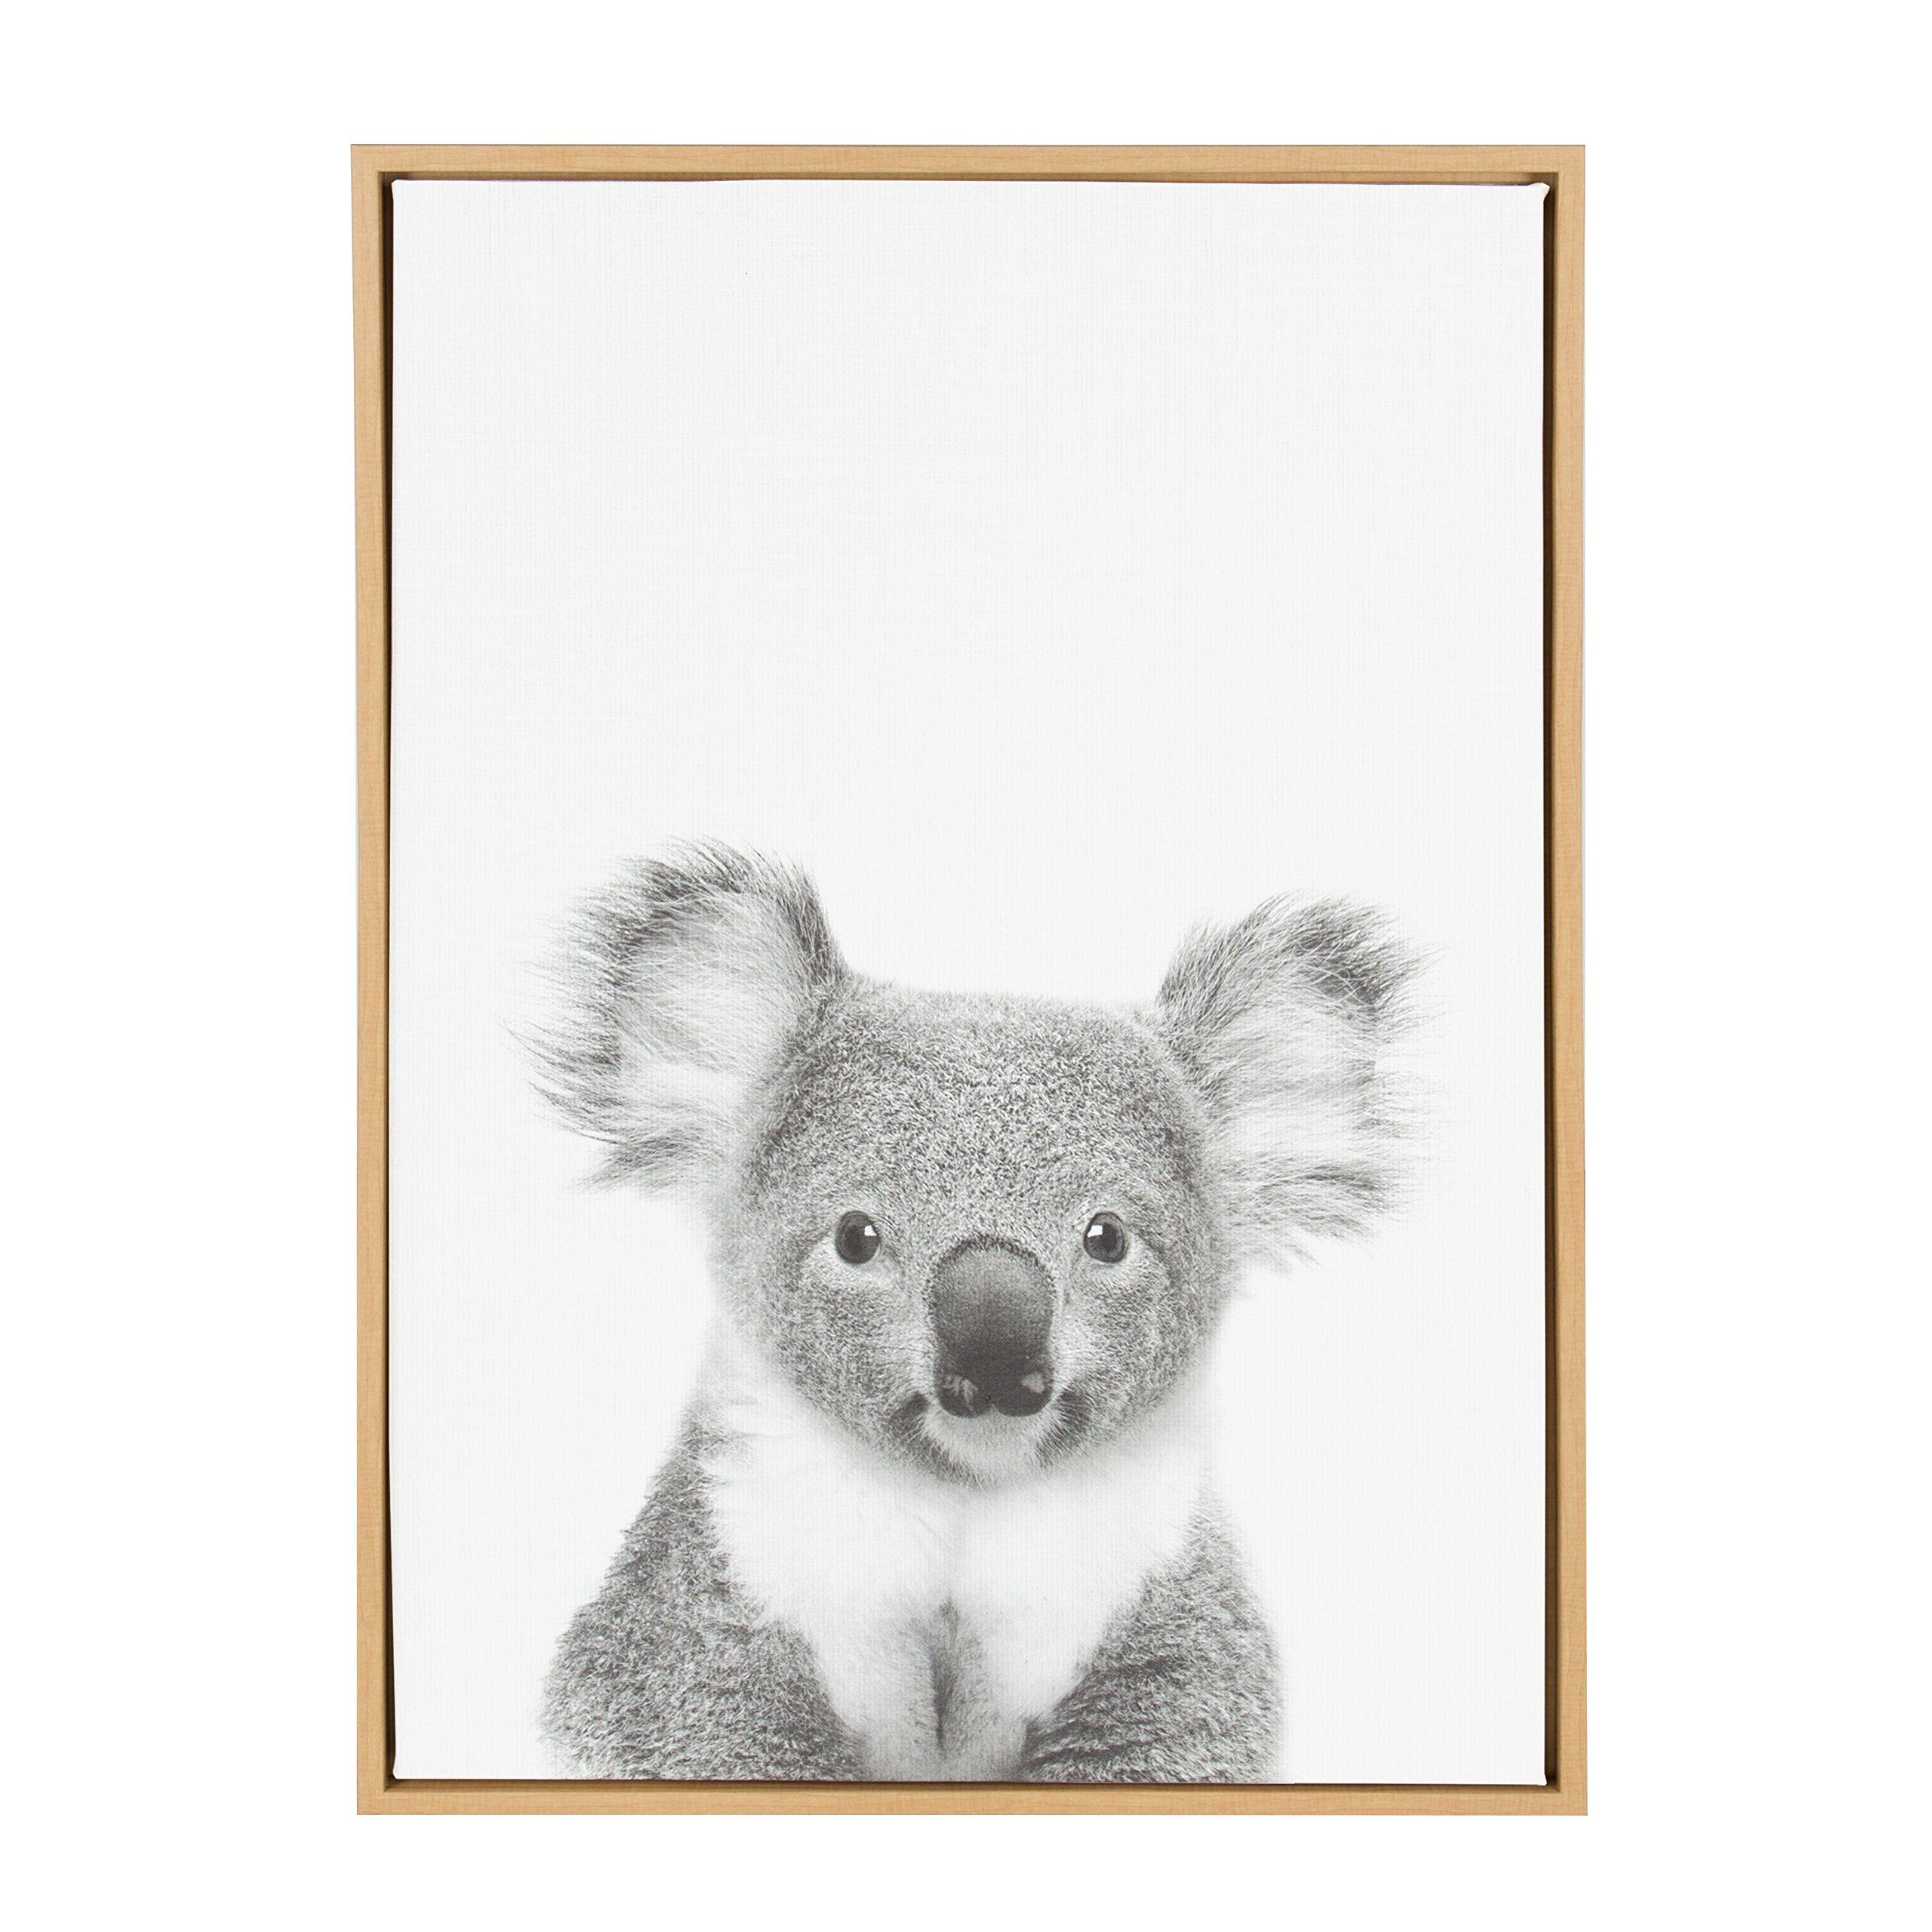 Kate and Laurel - Sylvie Koala Animal Print Black and White Framed Canvas Wall Art by Simon Te Tai, Natural 23x33